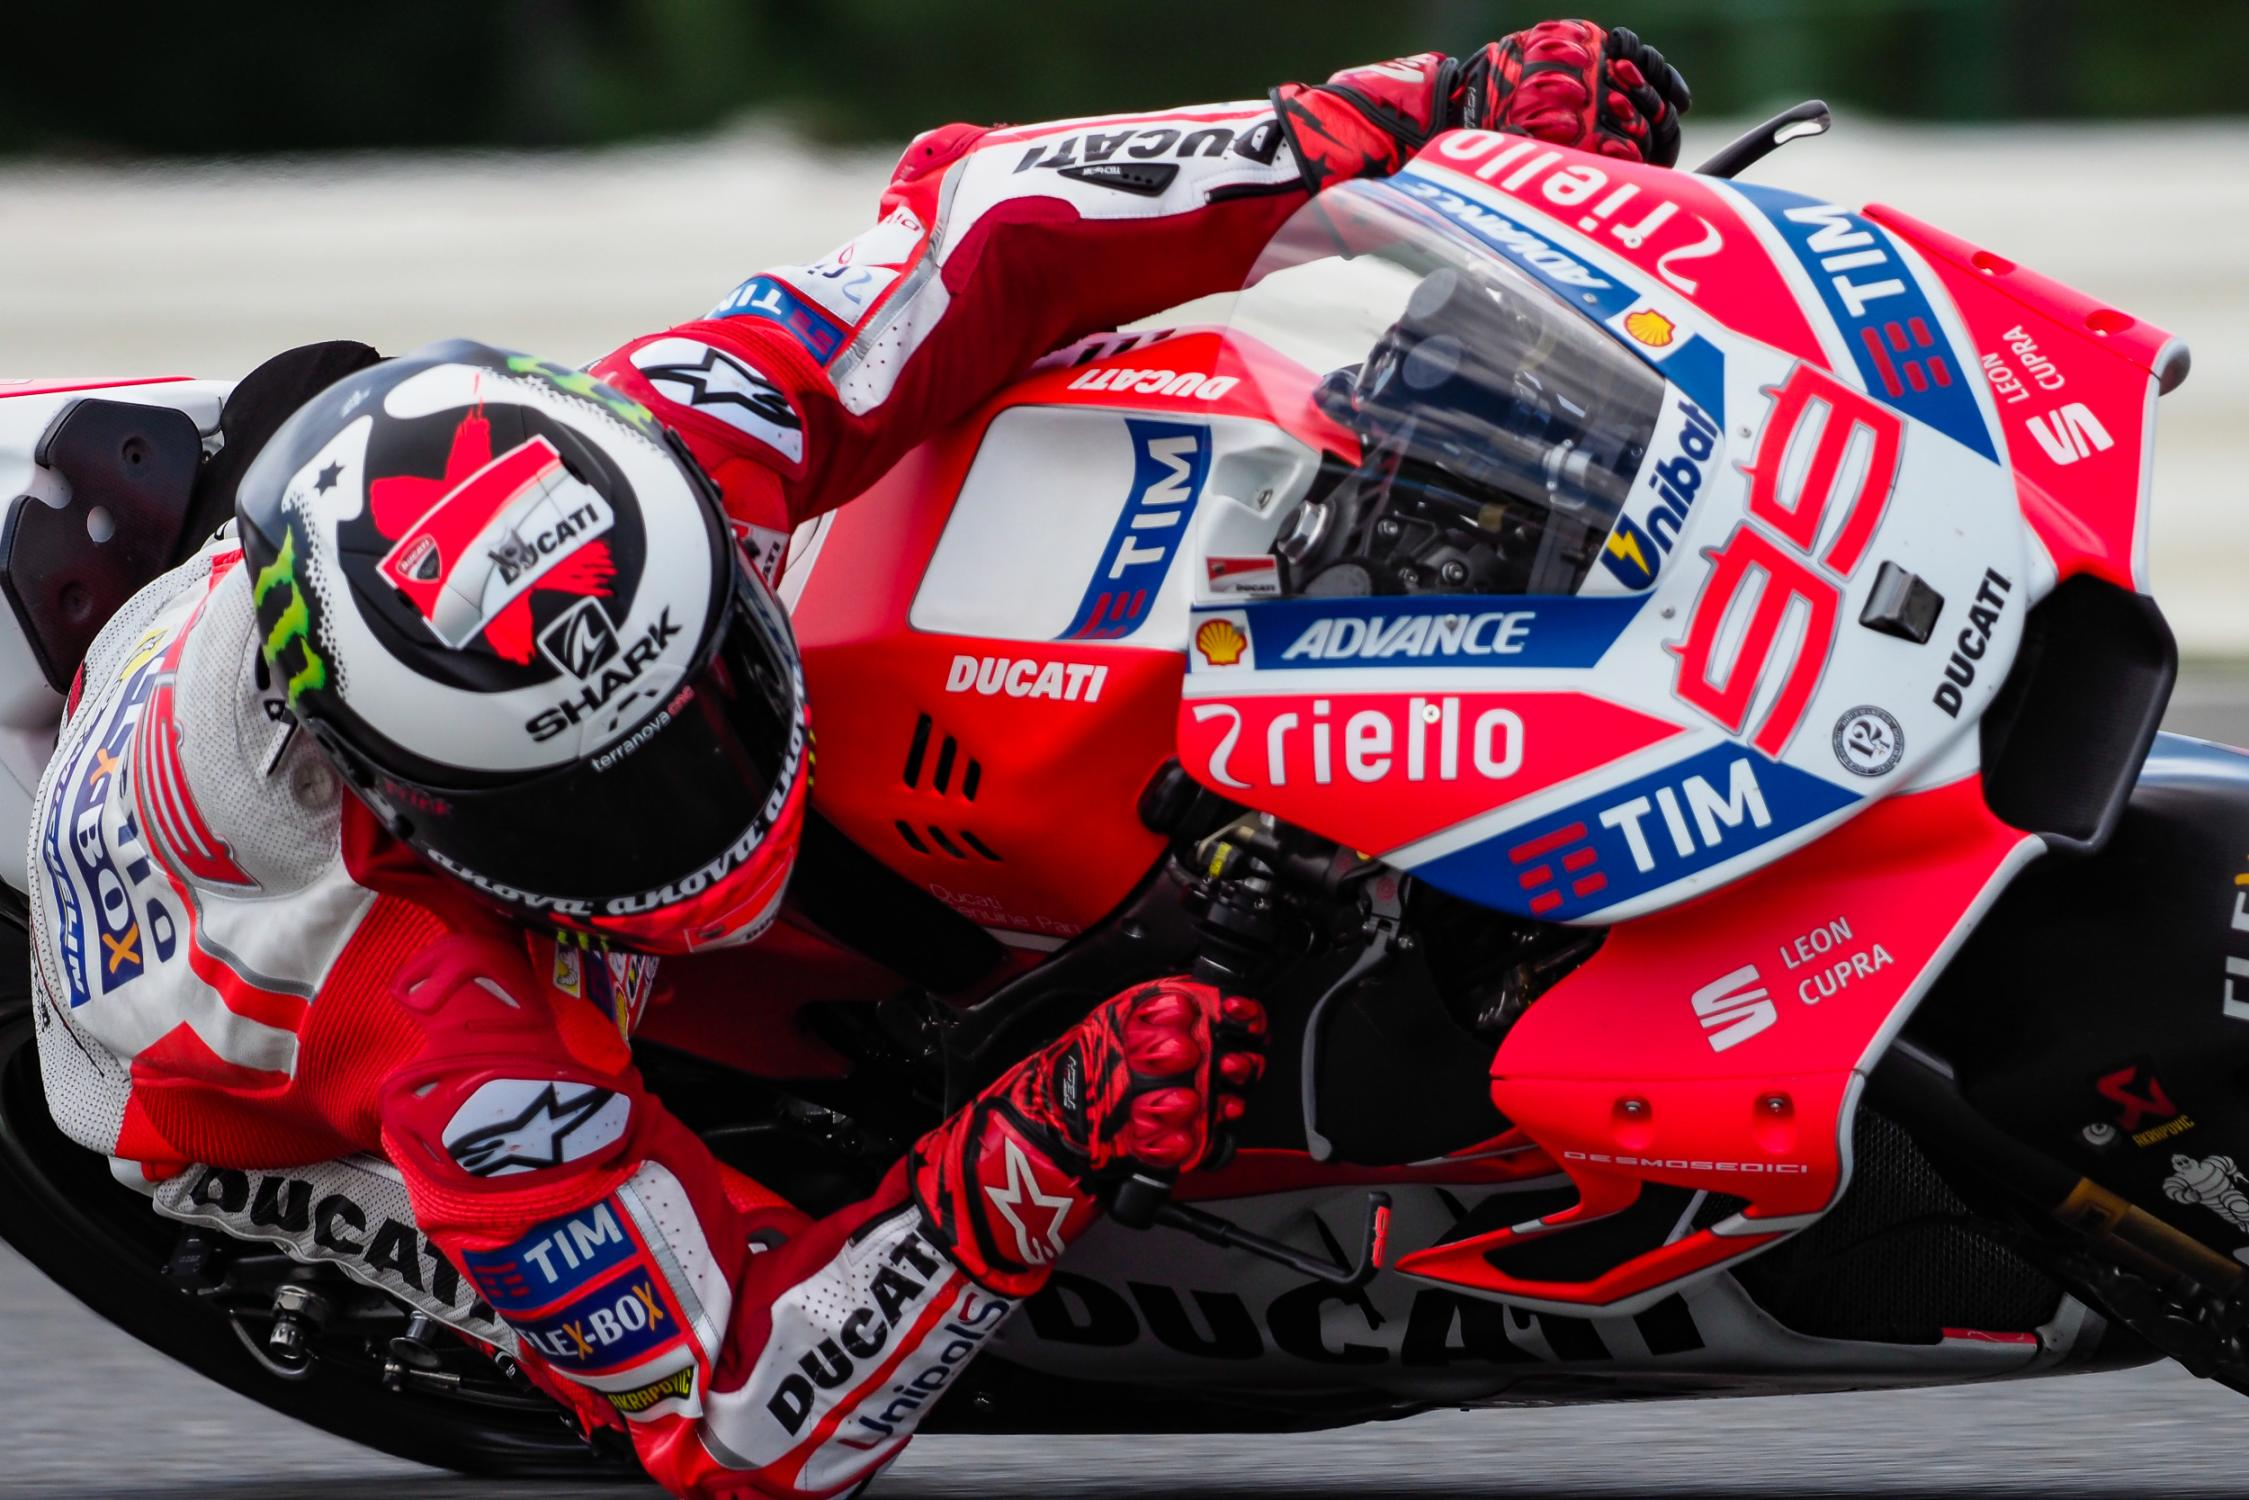 [GP] Brno 99-jorge-lorenzo-esp_8070351.gallery_full_top_fullscreen